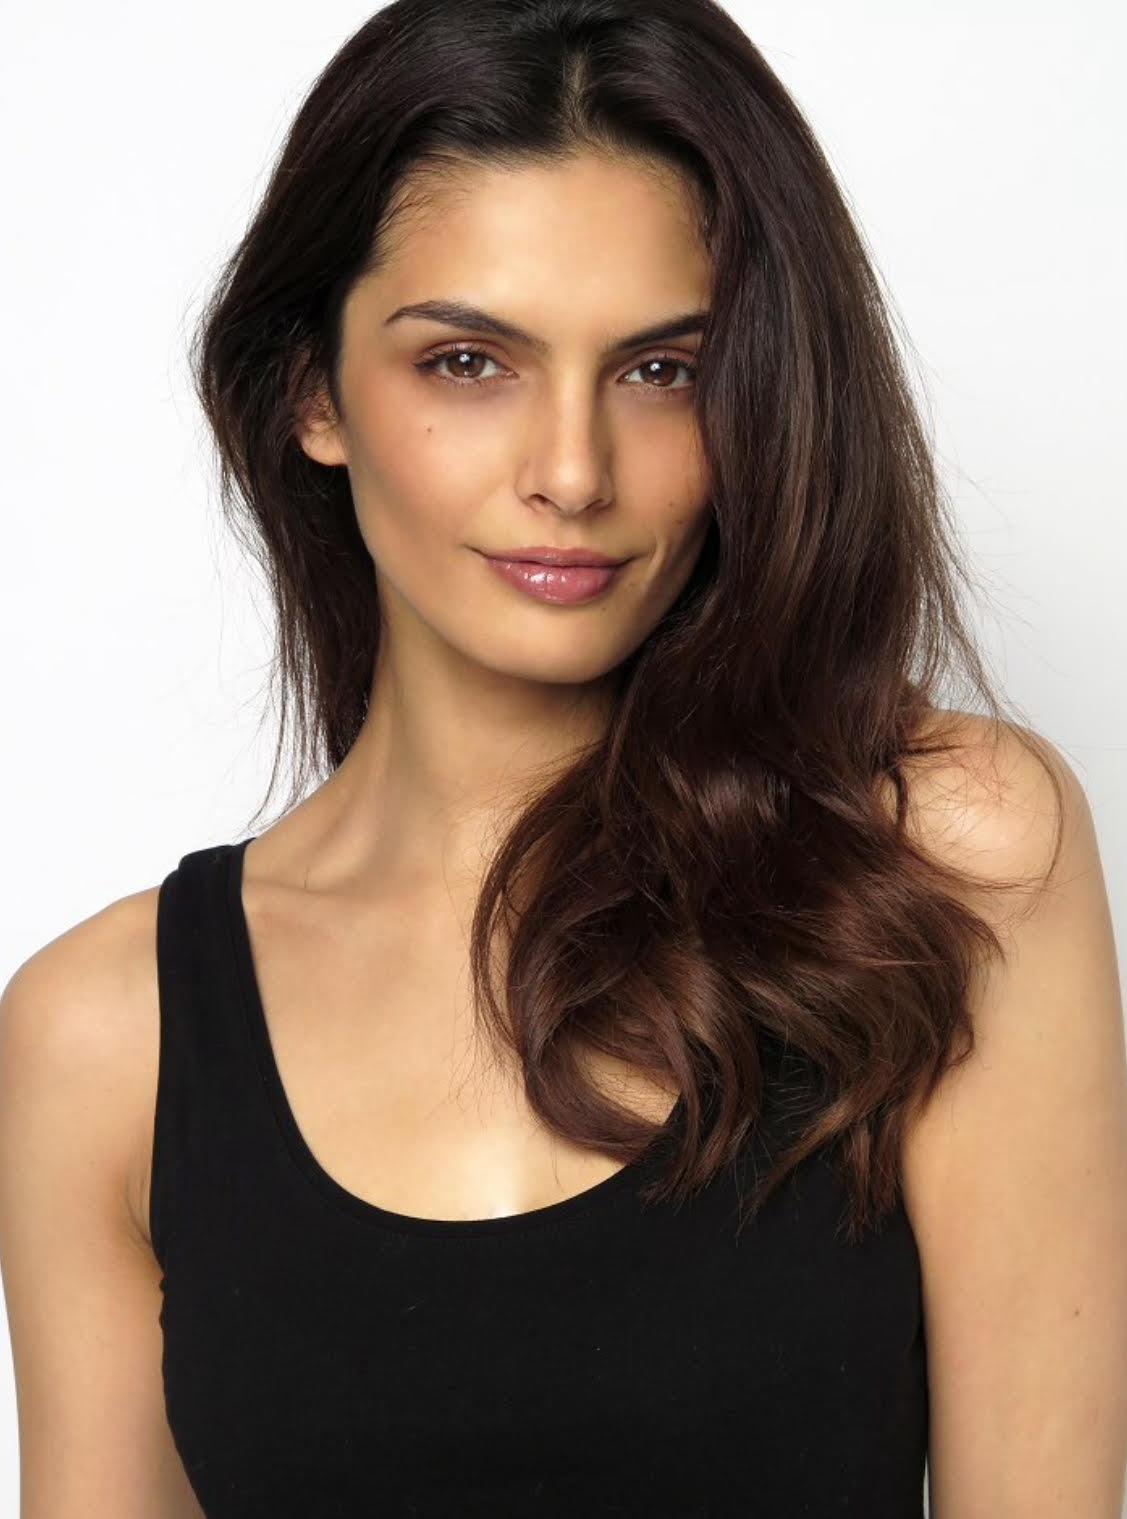 Veena Profile